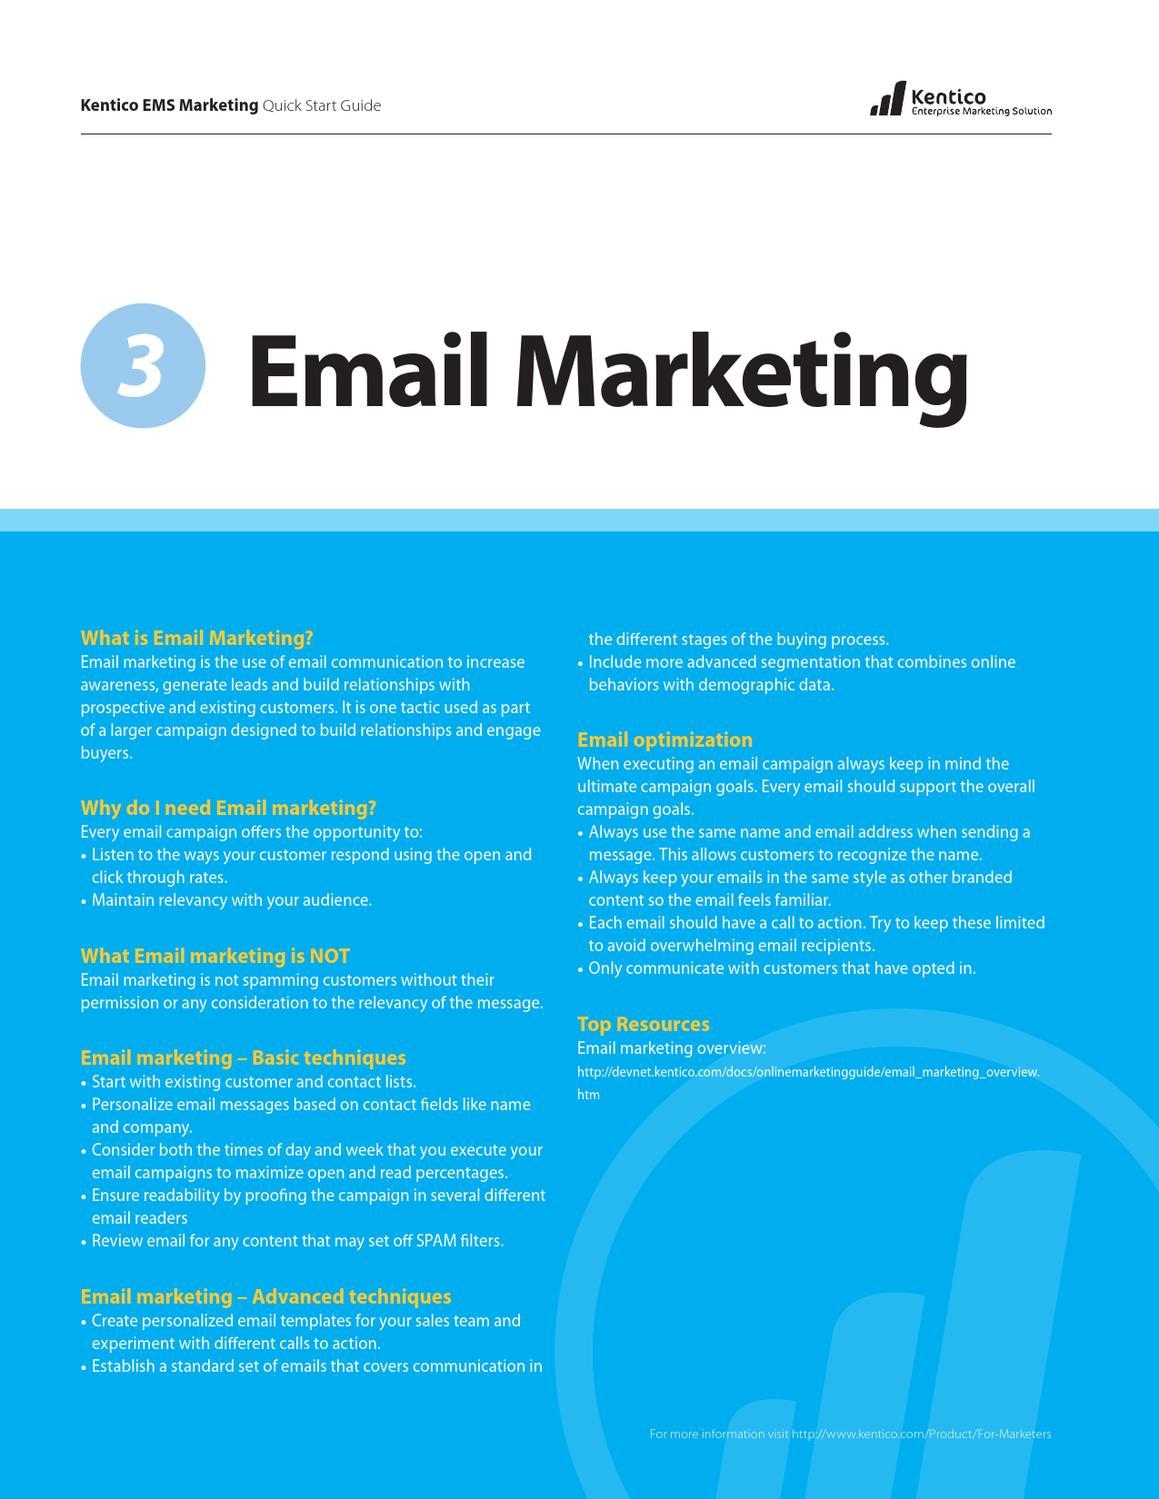 Kentico Ems Quick Start Guides Email Marketing By Thomas Robbins